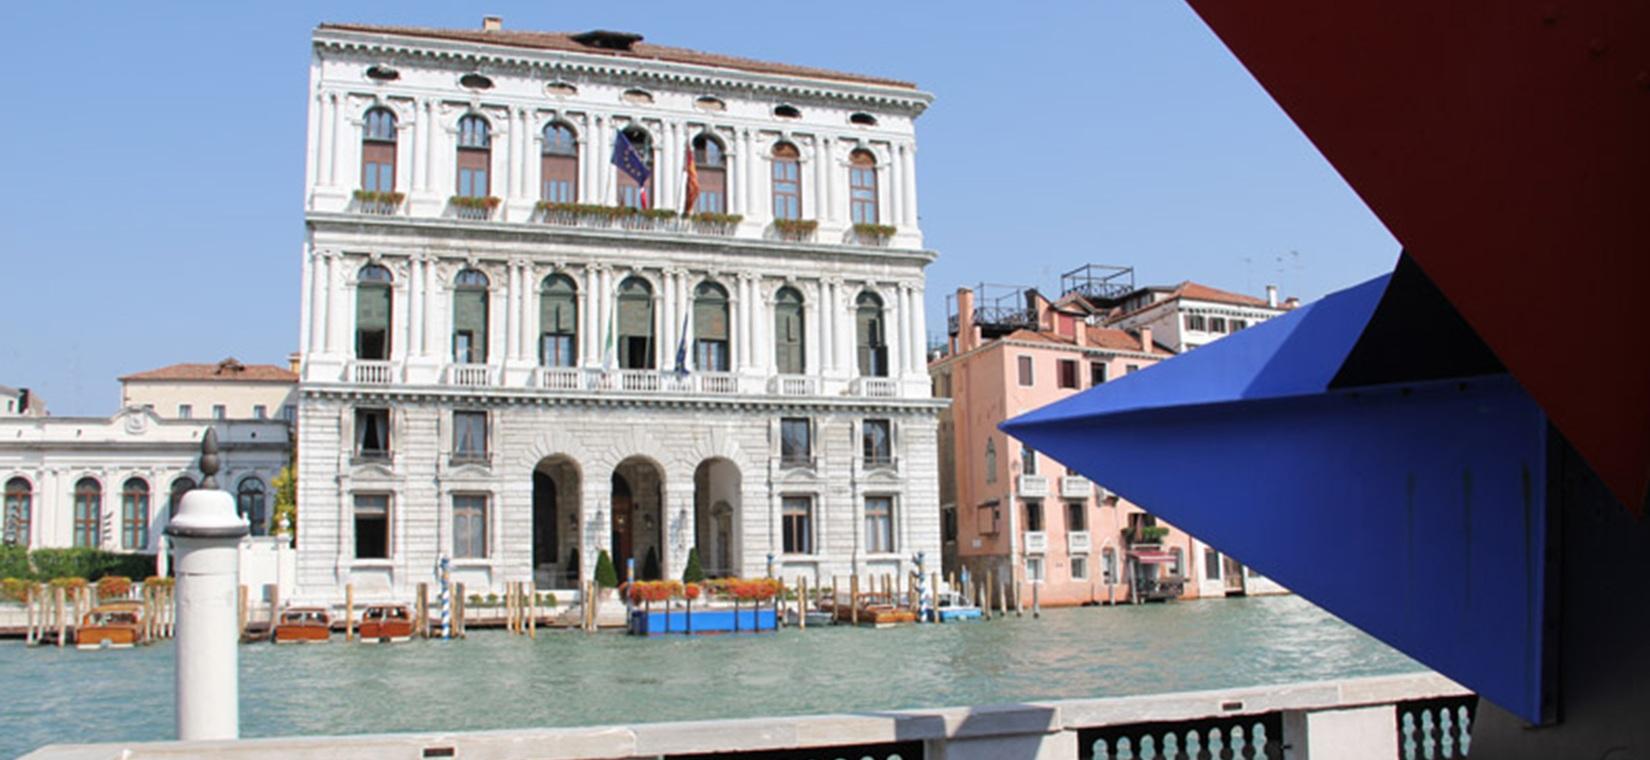 Peggy Guggenheim Venice 2011.jpg